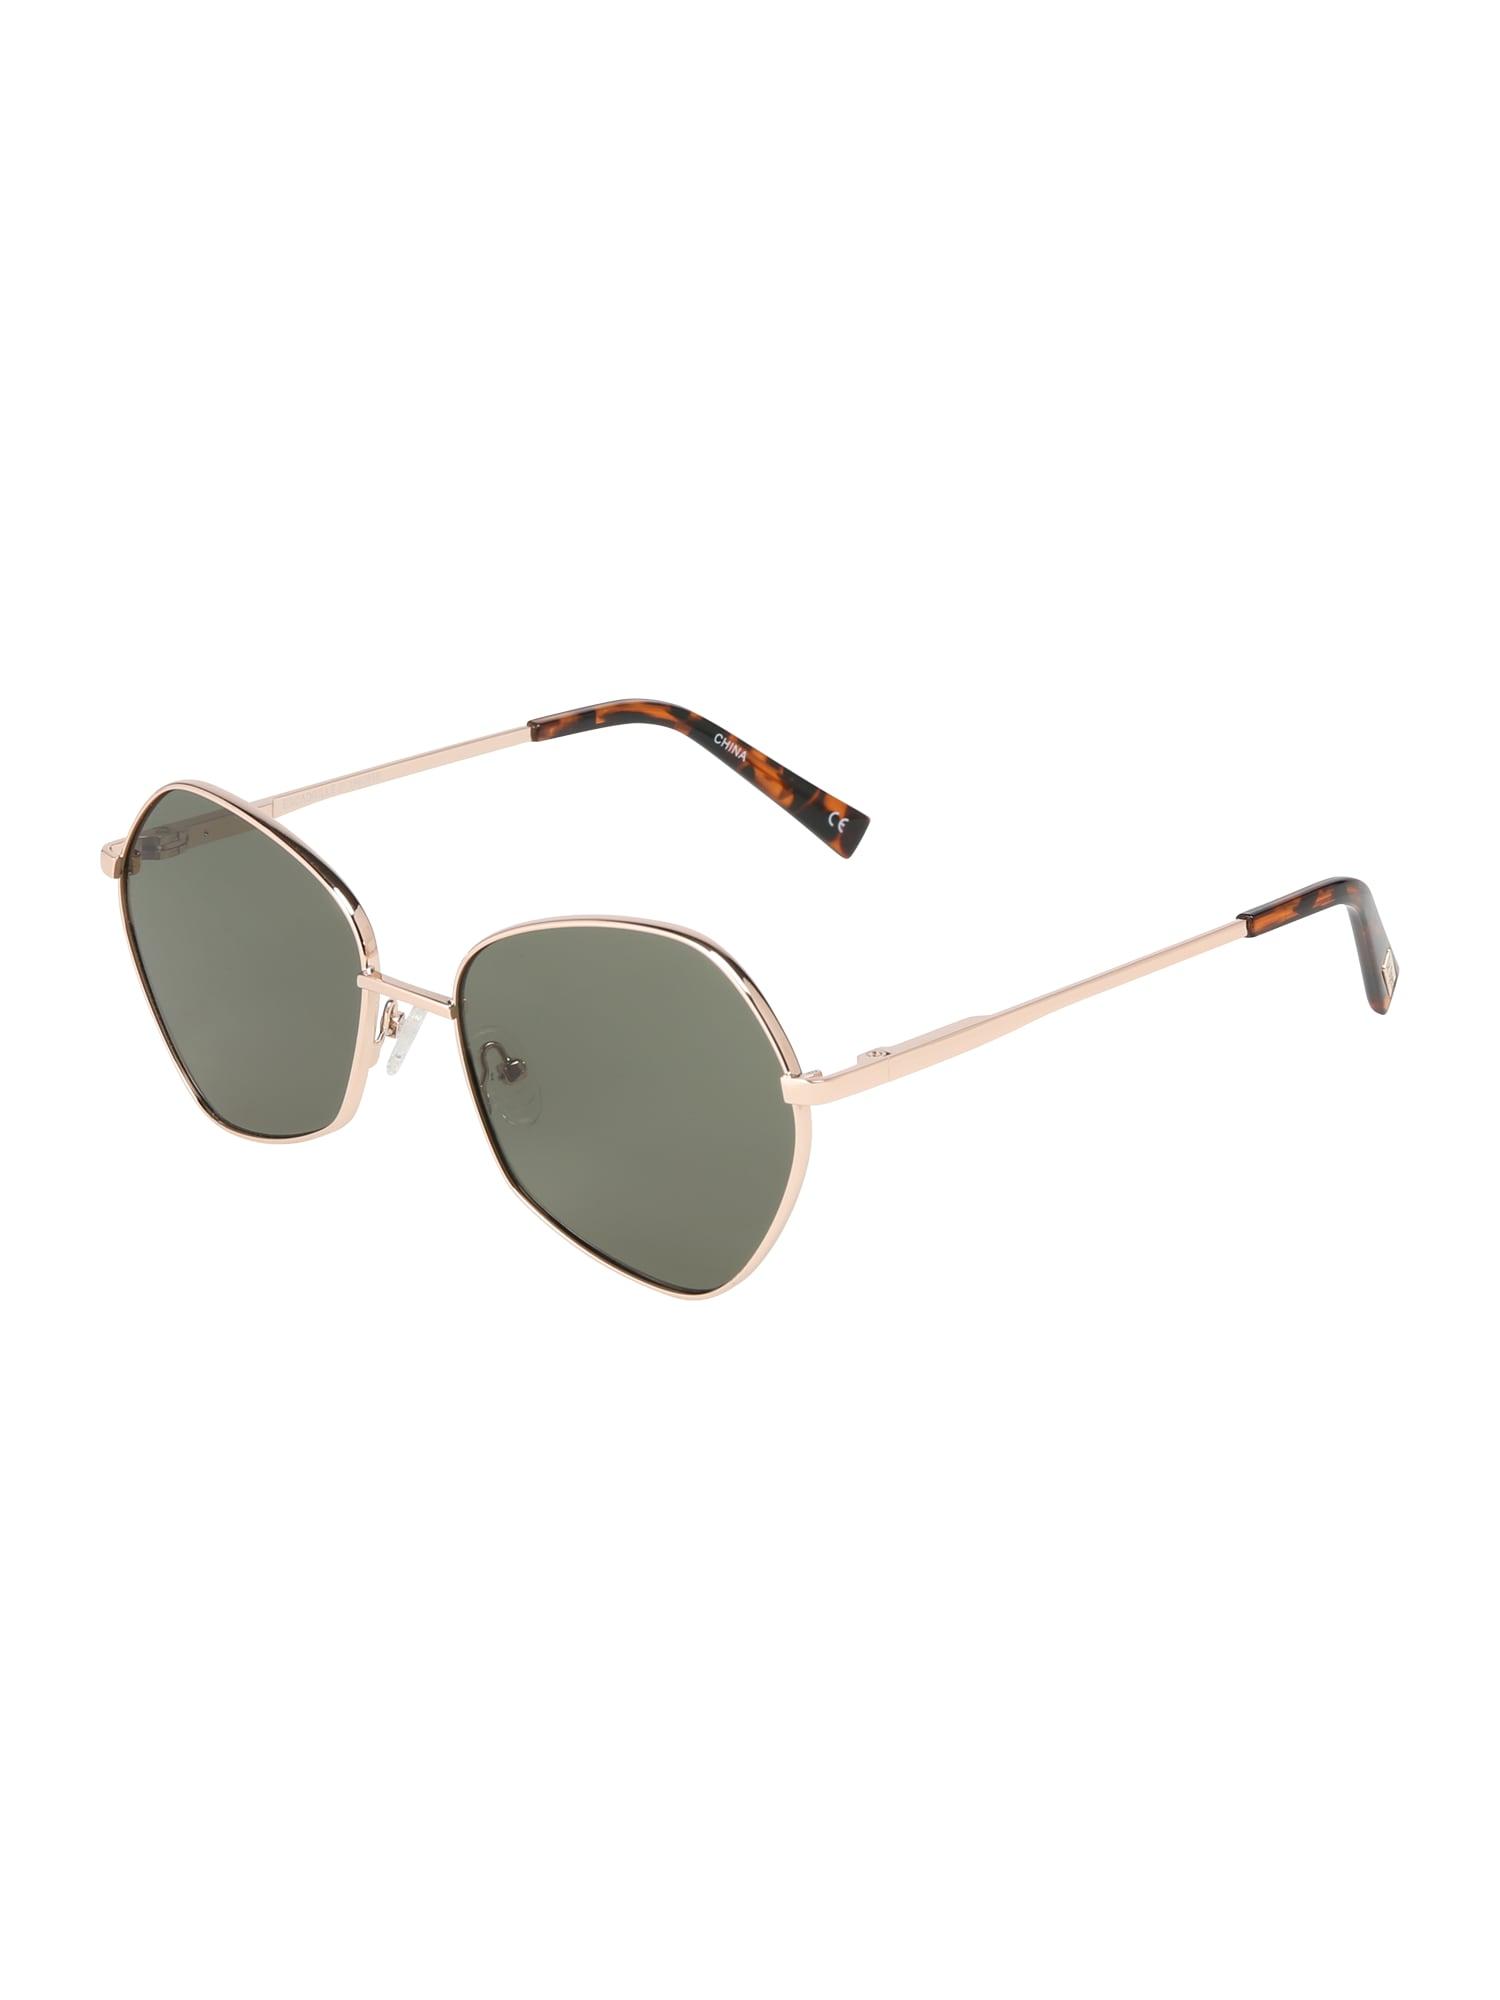 Sluneční brýle ESCADRILLE zlatá khaki LE SPECS